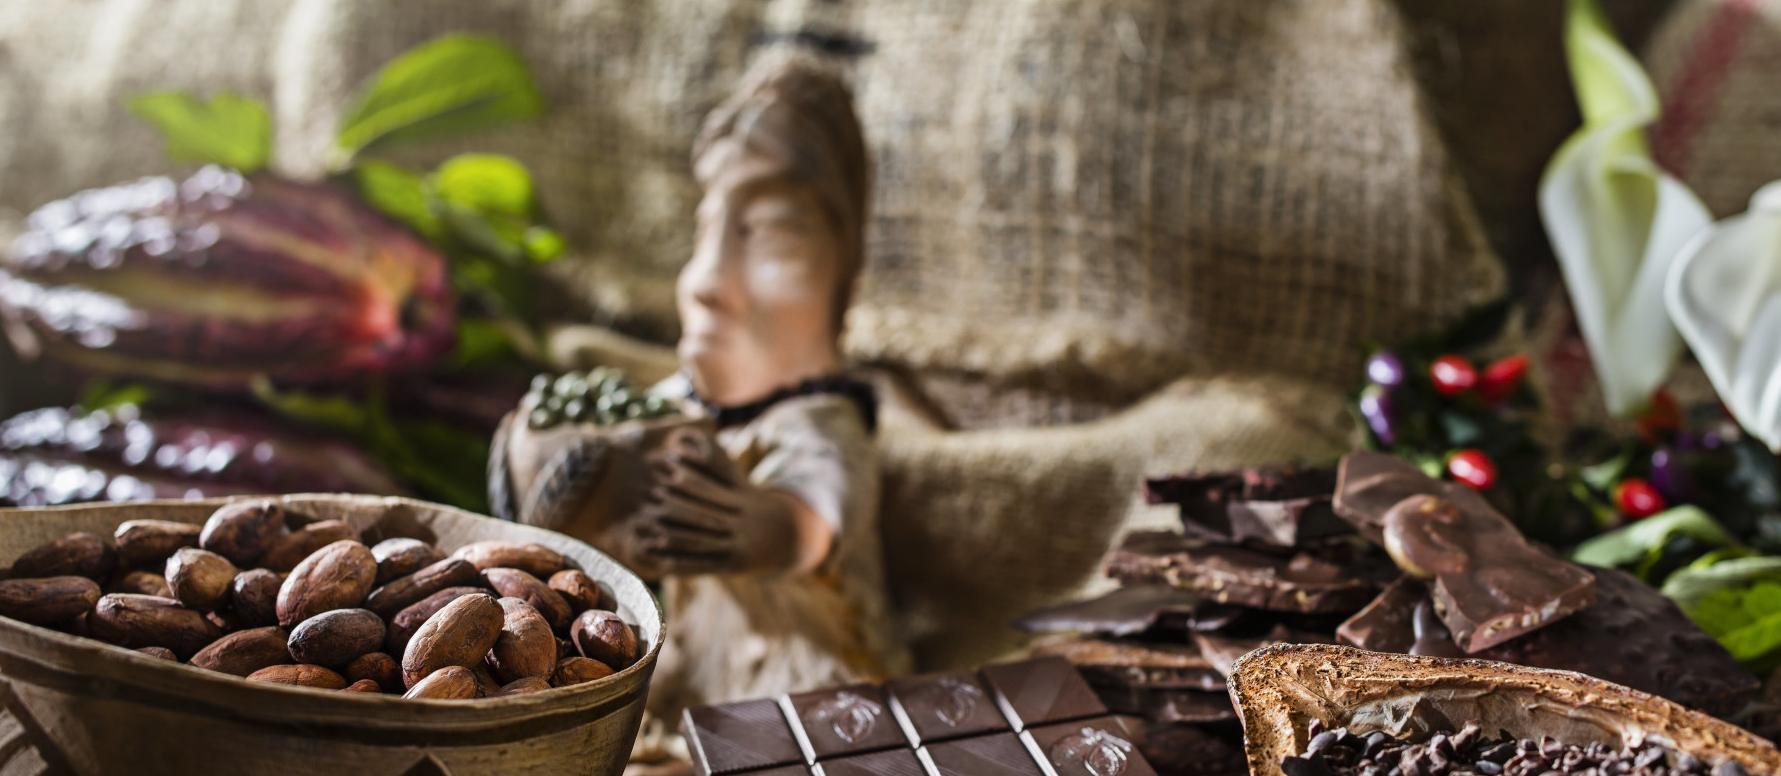 Schokoladenfoto Maya